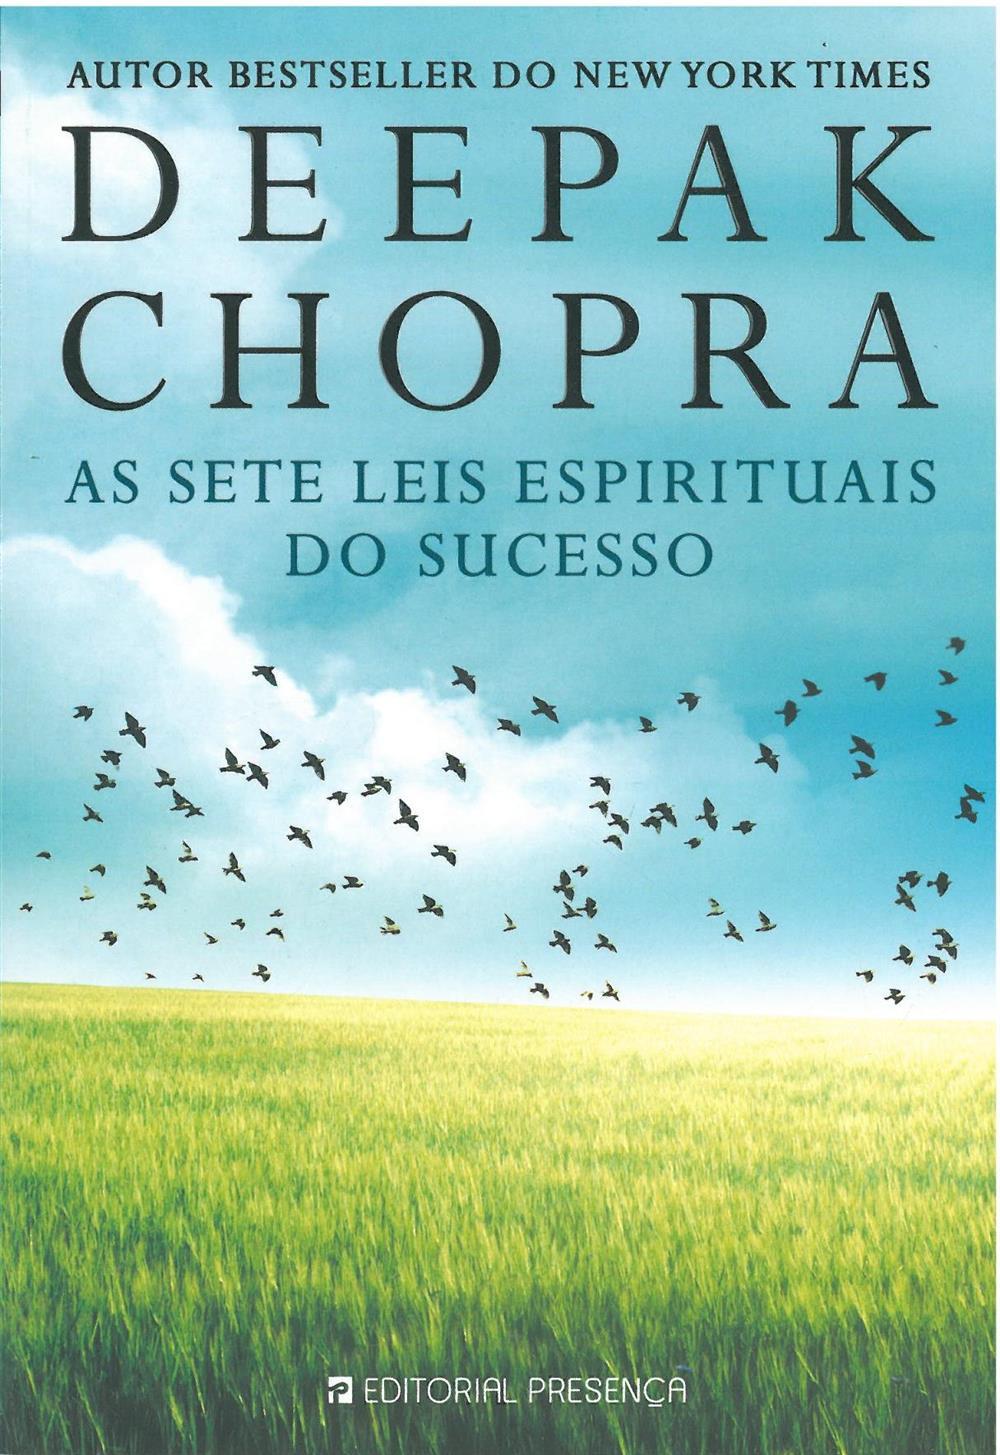 As sete leis espirituais do sucesso_.jpg